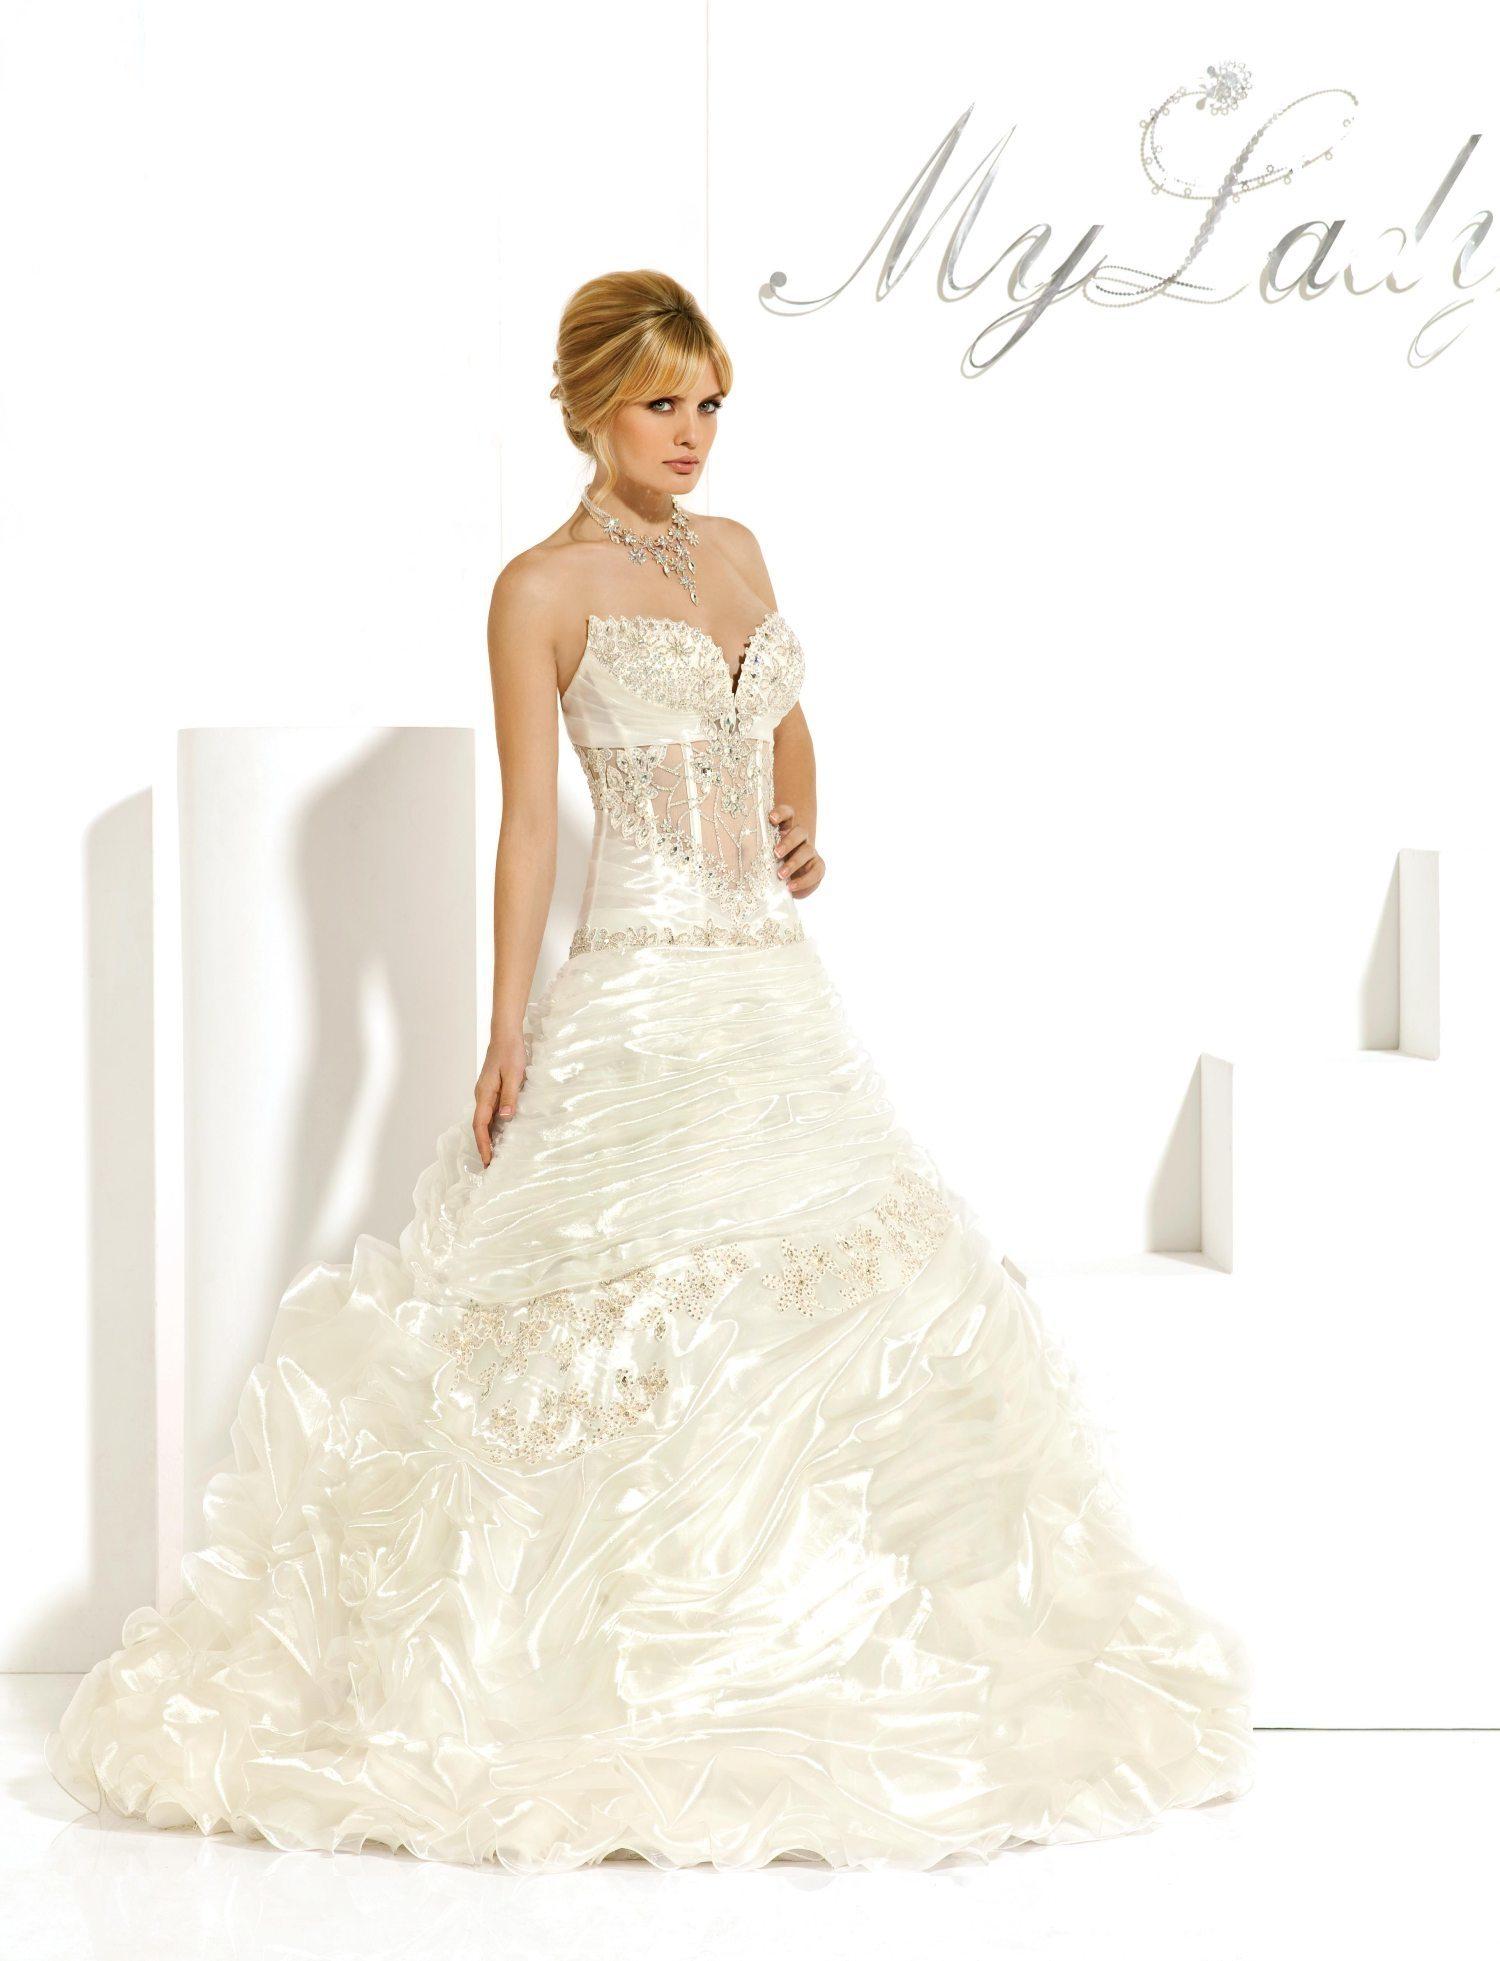 9f4f001f3dfb Dress - Lady Butterfly - Lady Butterfly Skirt - Lady Butterfly ...